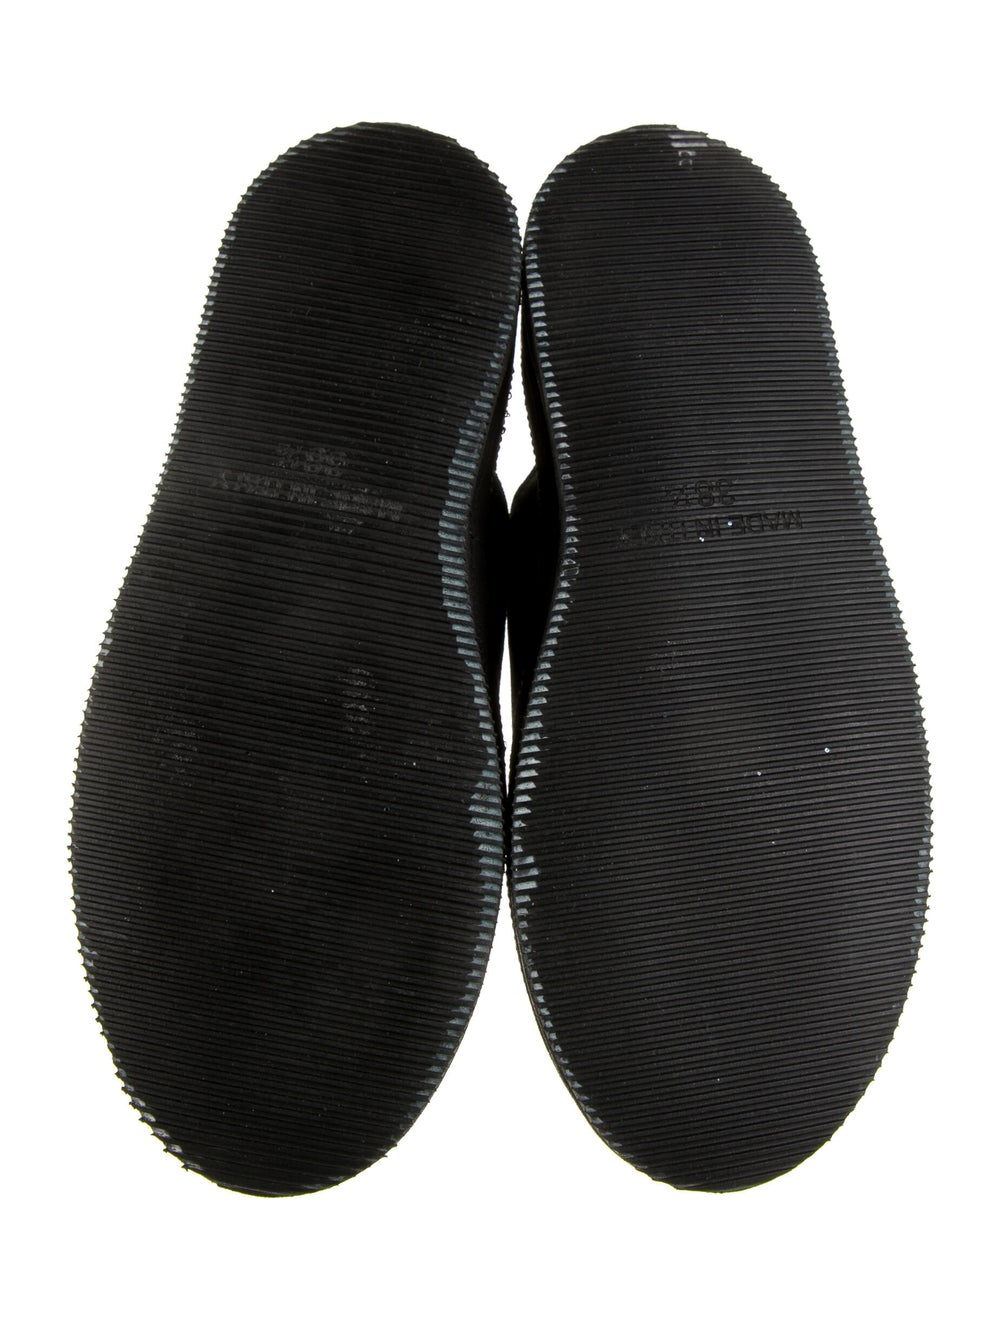 Ann Demeulemeester Suede Sneakers Black - image 5